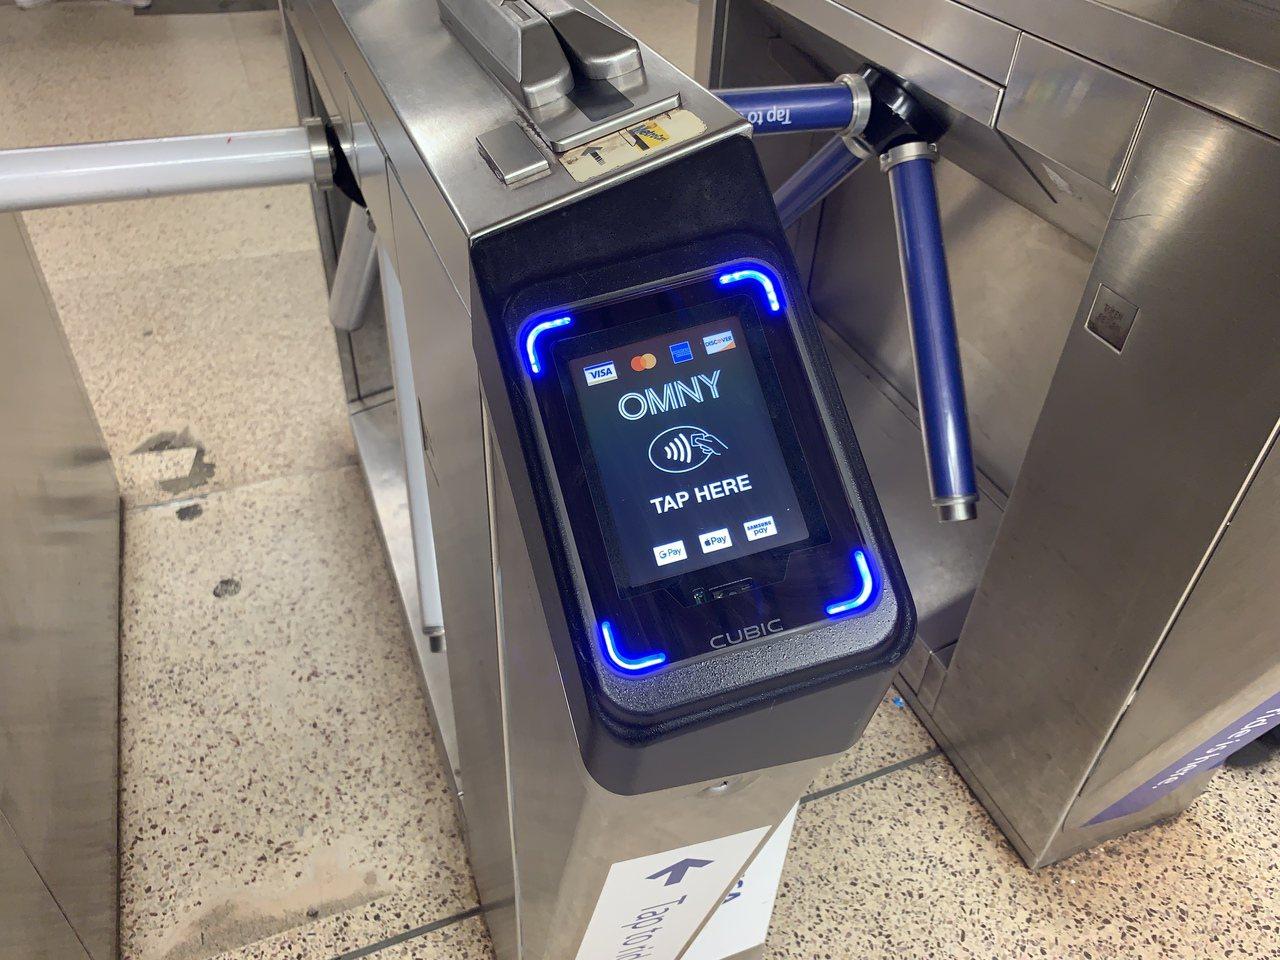 OMNY安装完毕捷运卡2023淘汰  生活艺文  纽约  世界新闻网